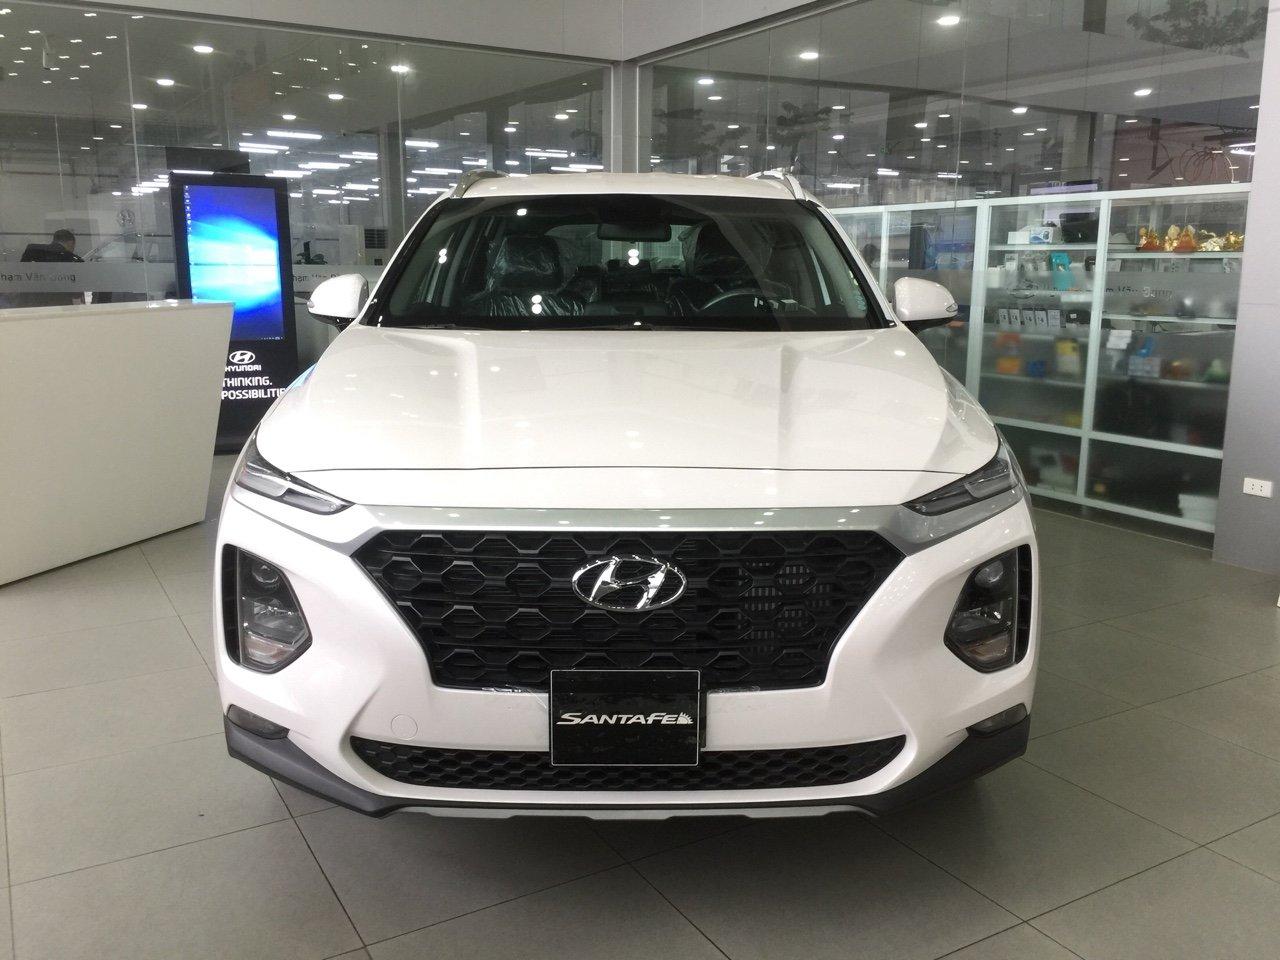 Hyundai santafe 2.2 máy dầu tiêu chuẩn (2)